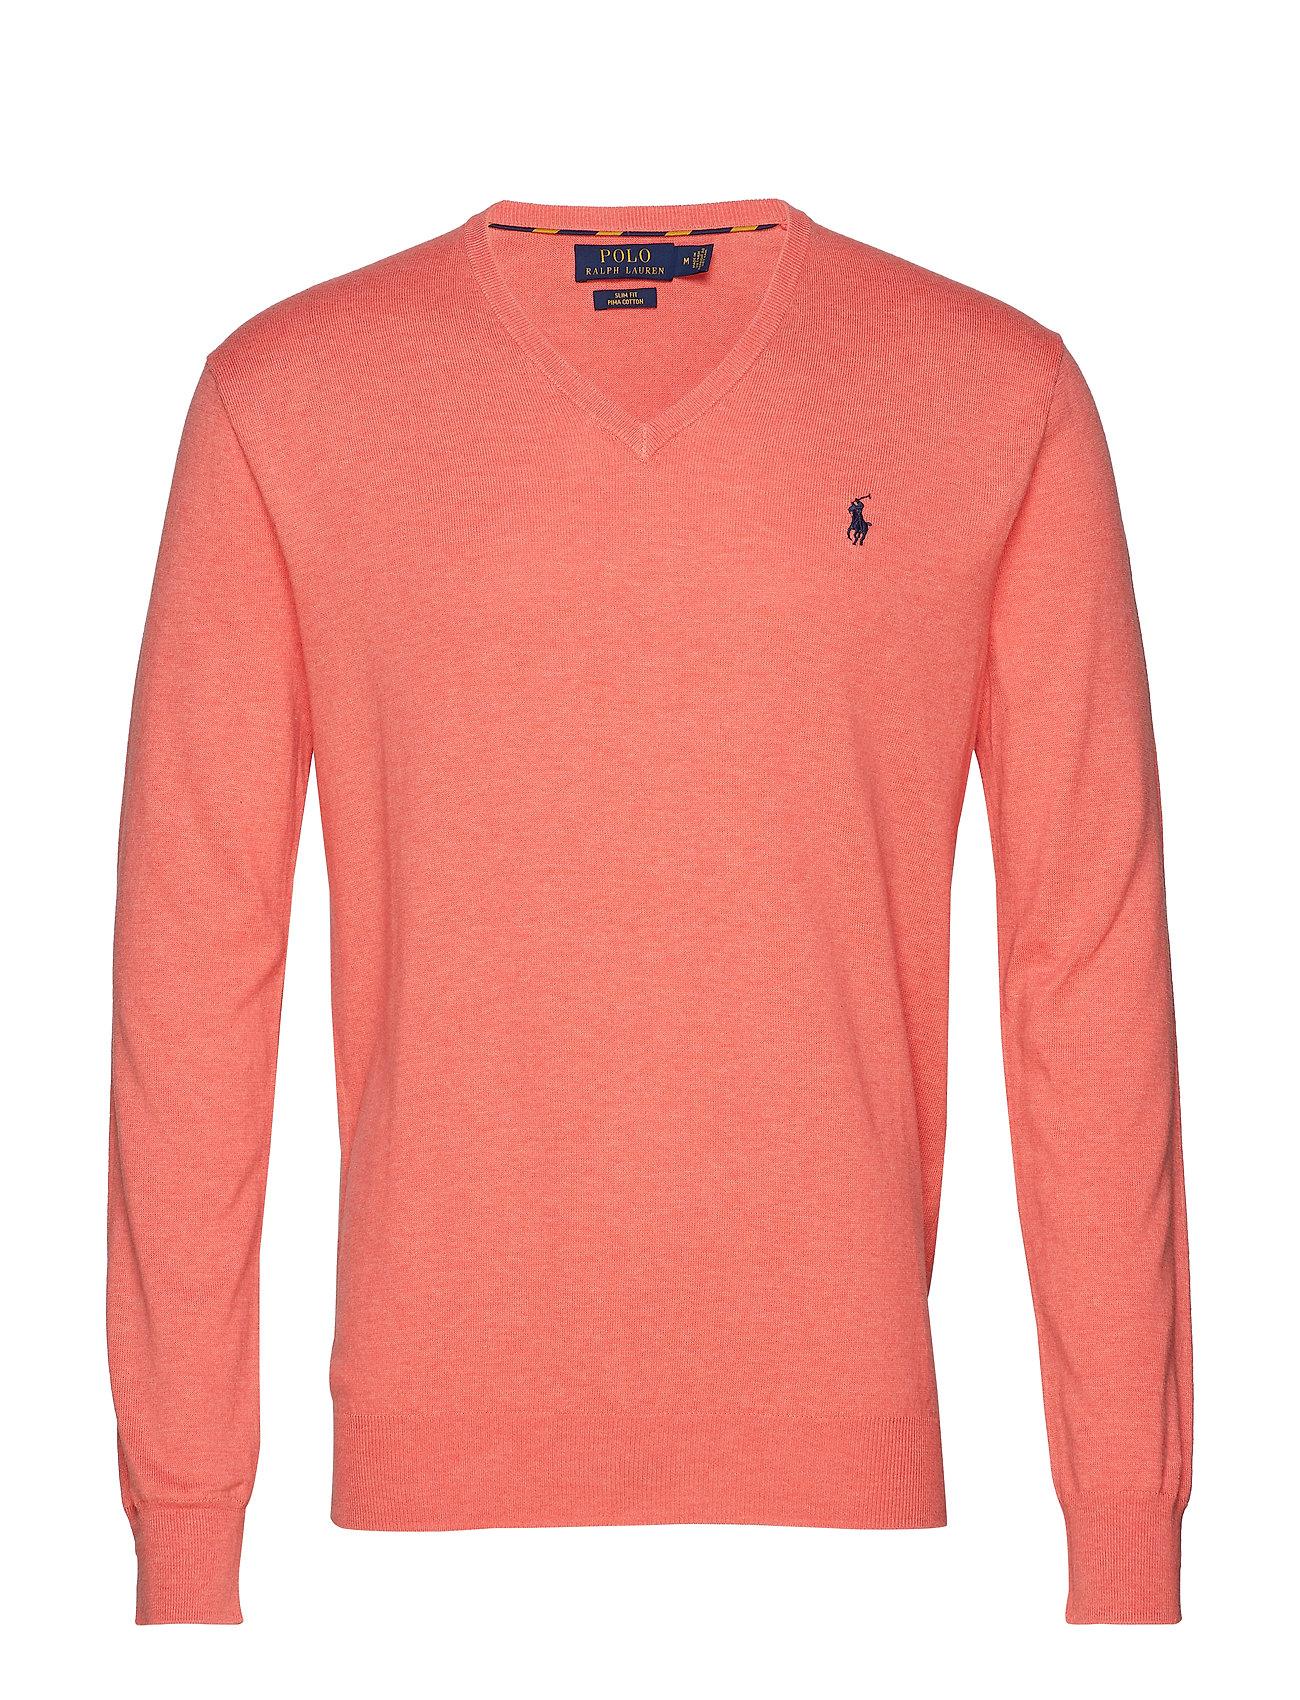 Polo Ralph Lauren Slim Fit Cotton V-Neck Sweater - DUSTY PEACH HEATH